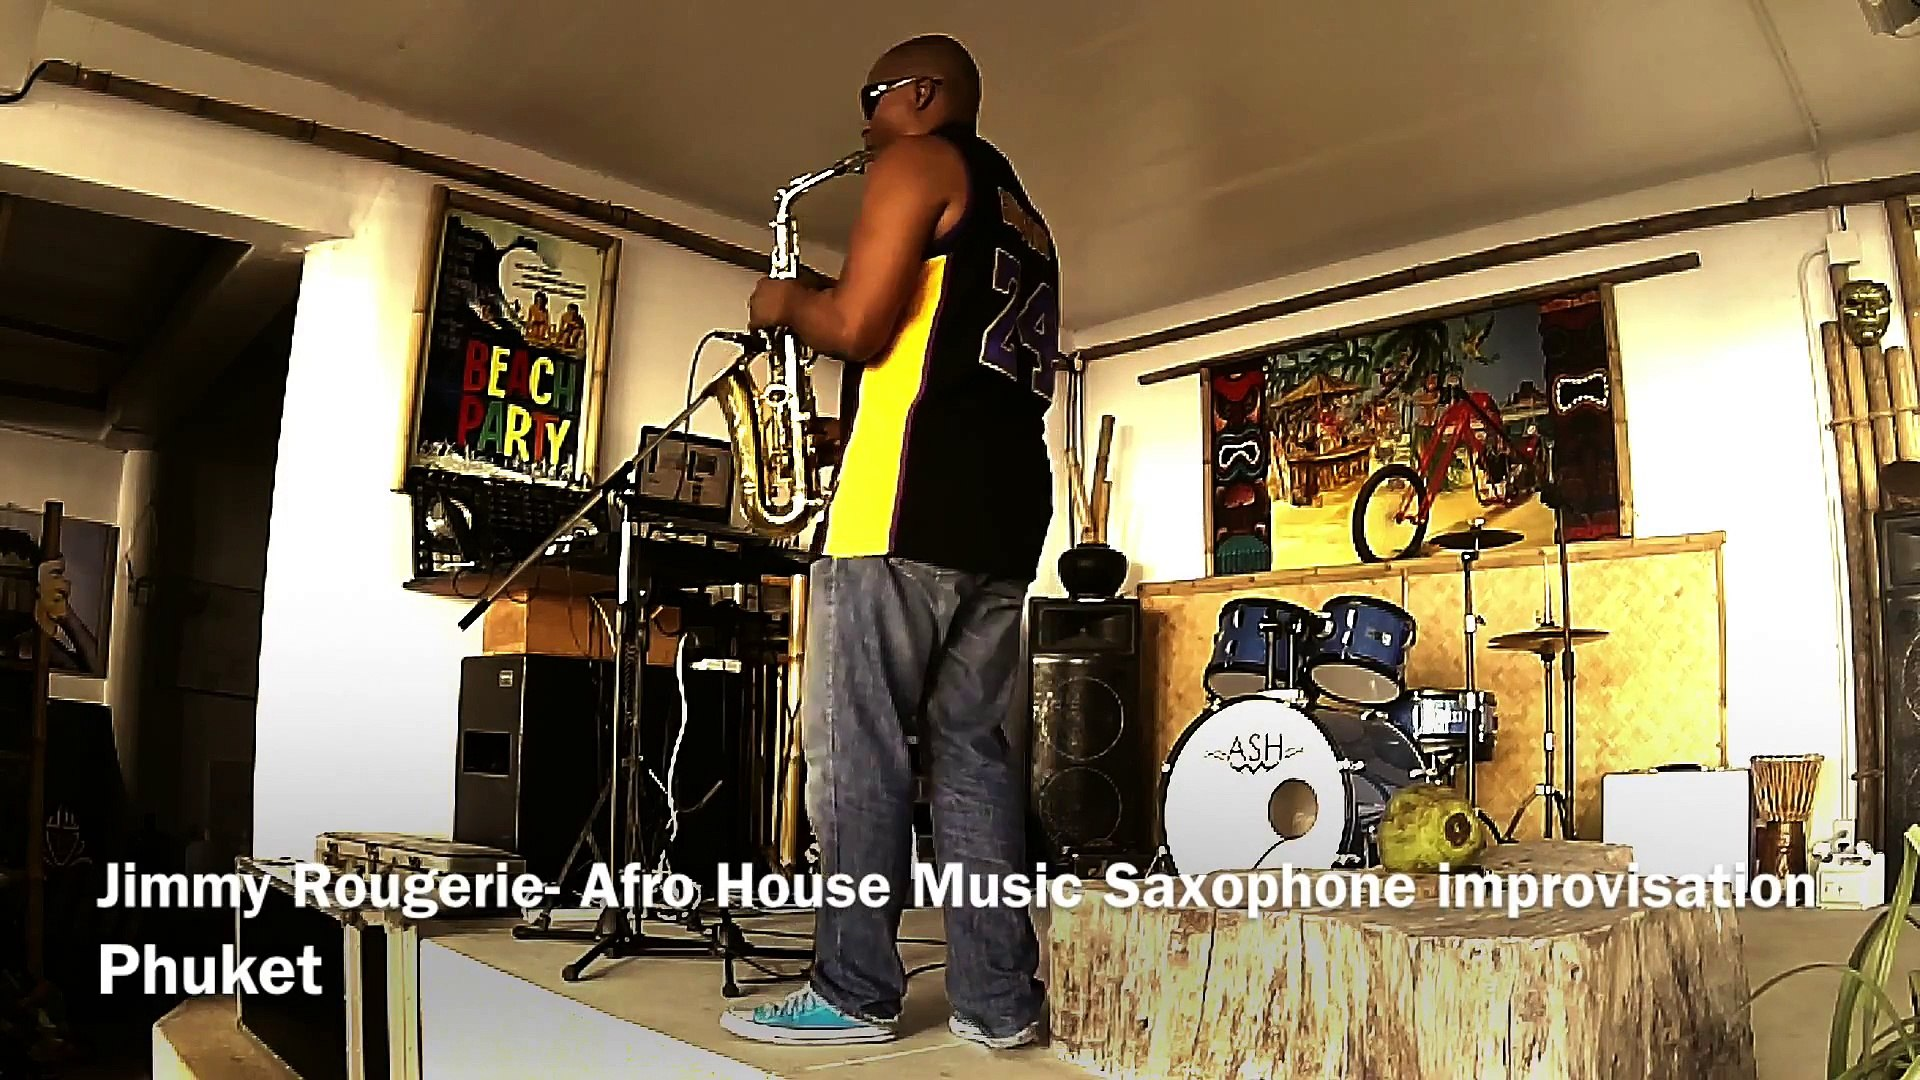 JimmyRougerie _ DJ SAXOPHONE _ Afro House Music & Saxophone improvisation